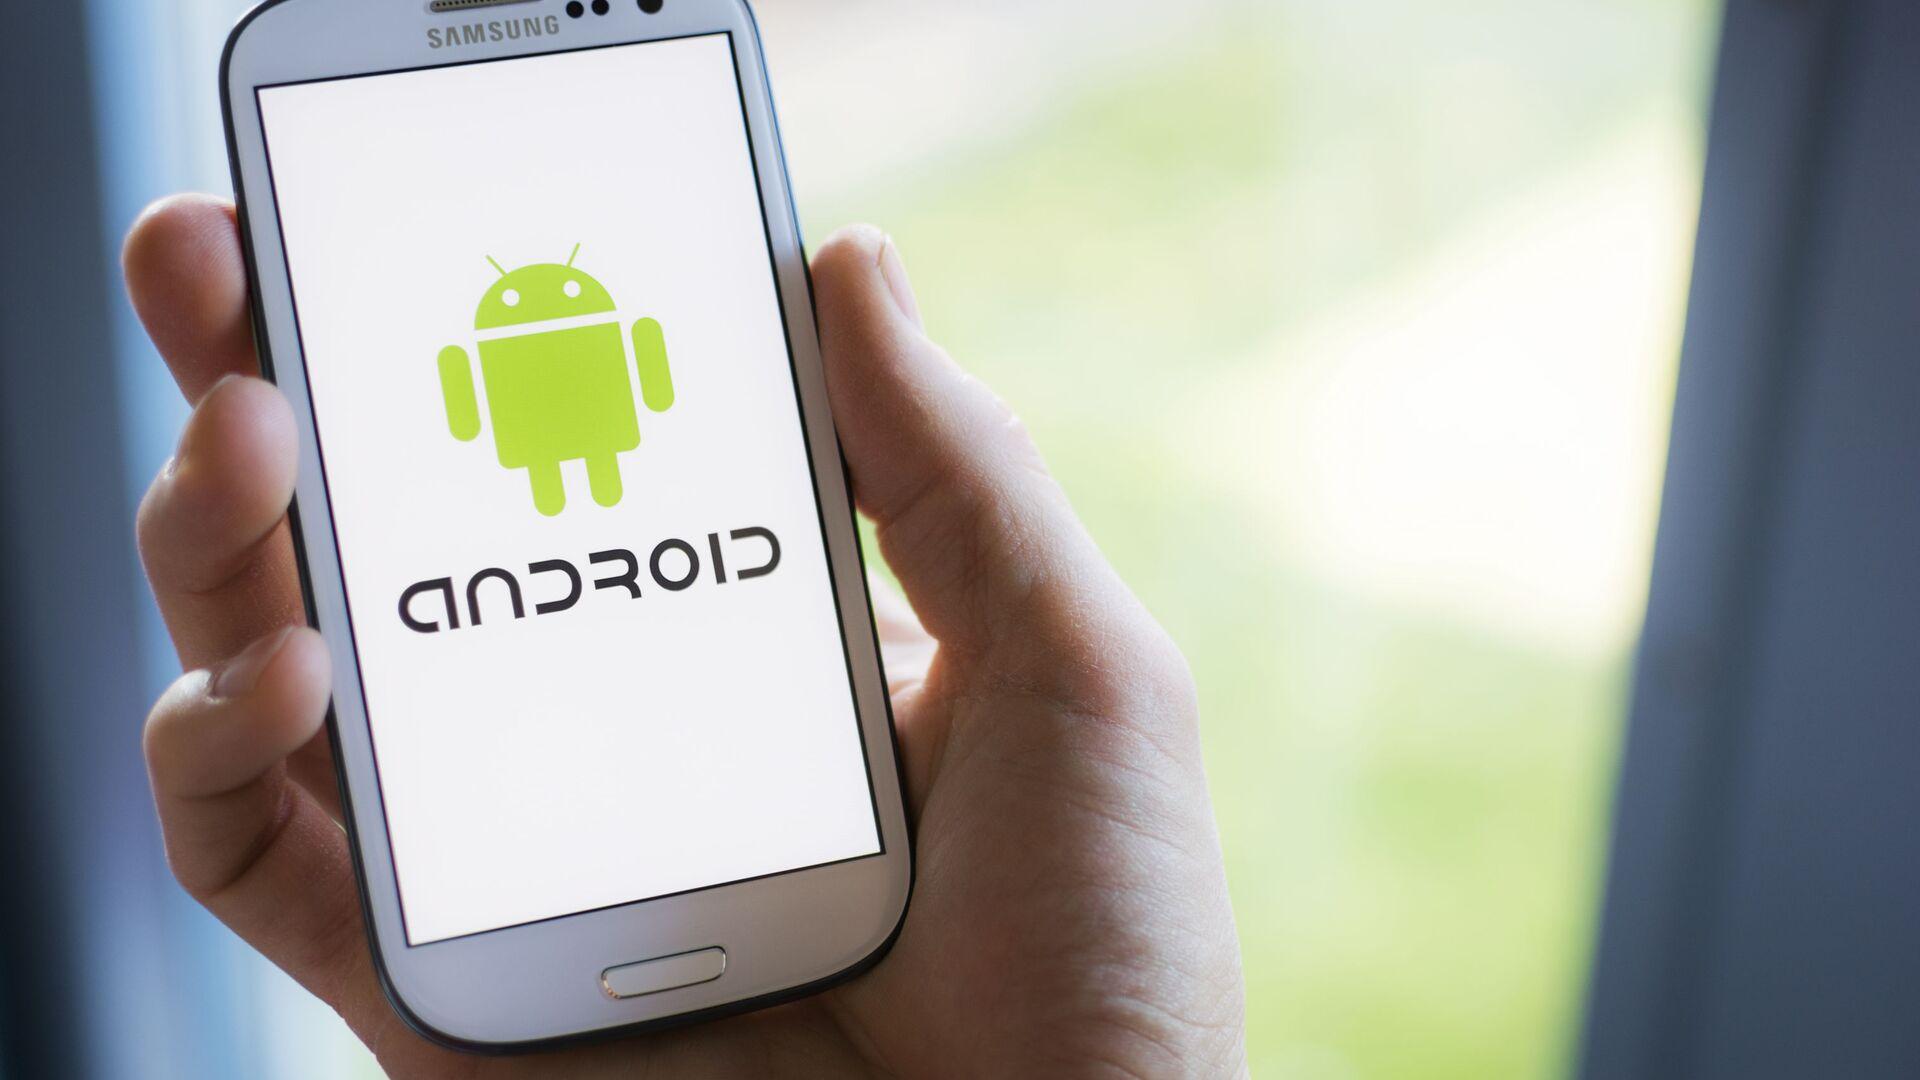 Android 12 avrà una nuova interfaccia? - Sputnik Italia, 1920, 09.02.2021